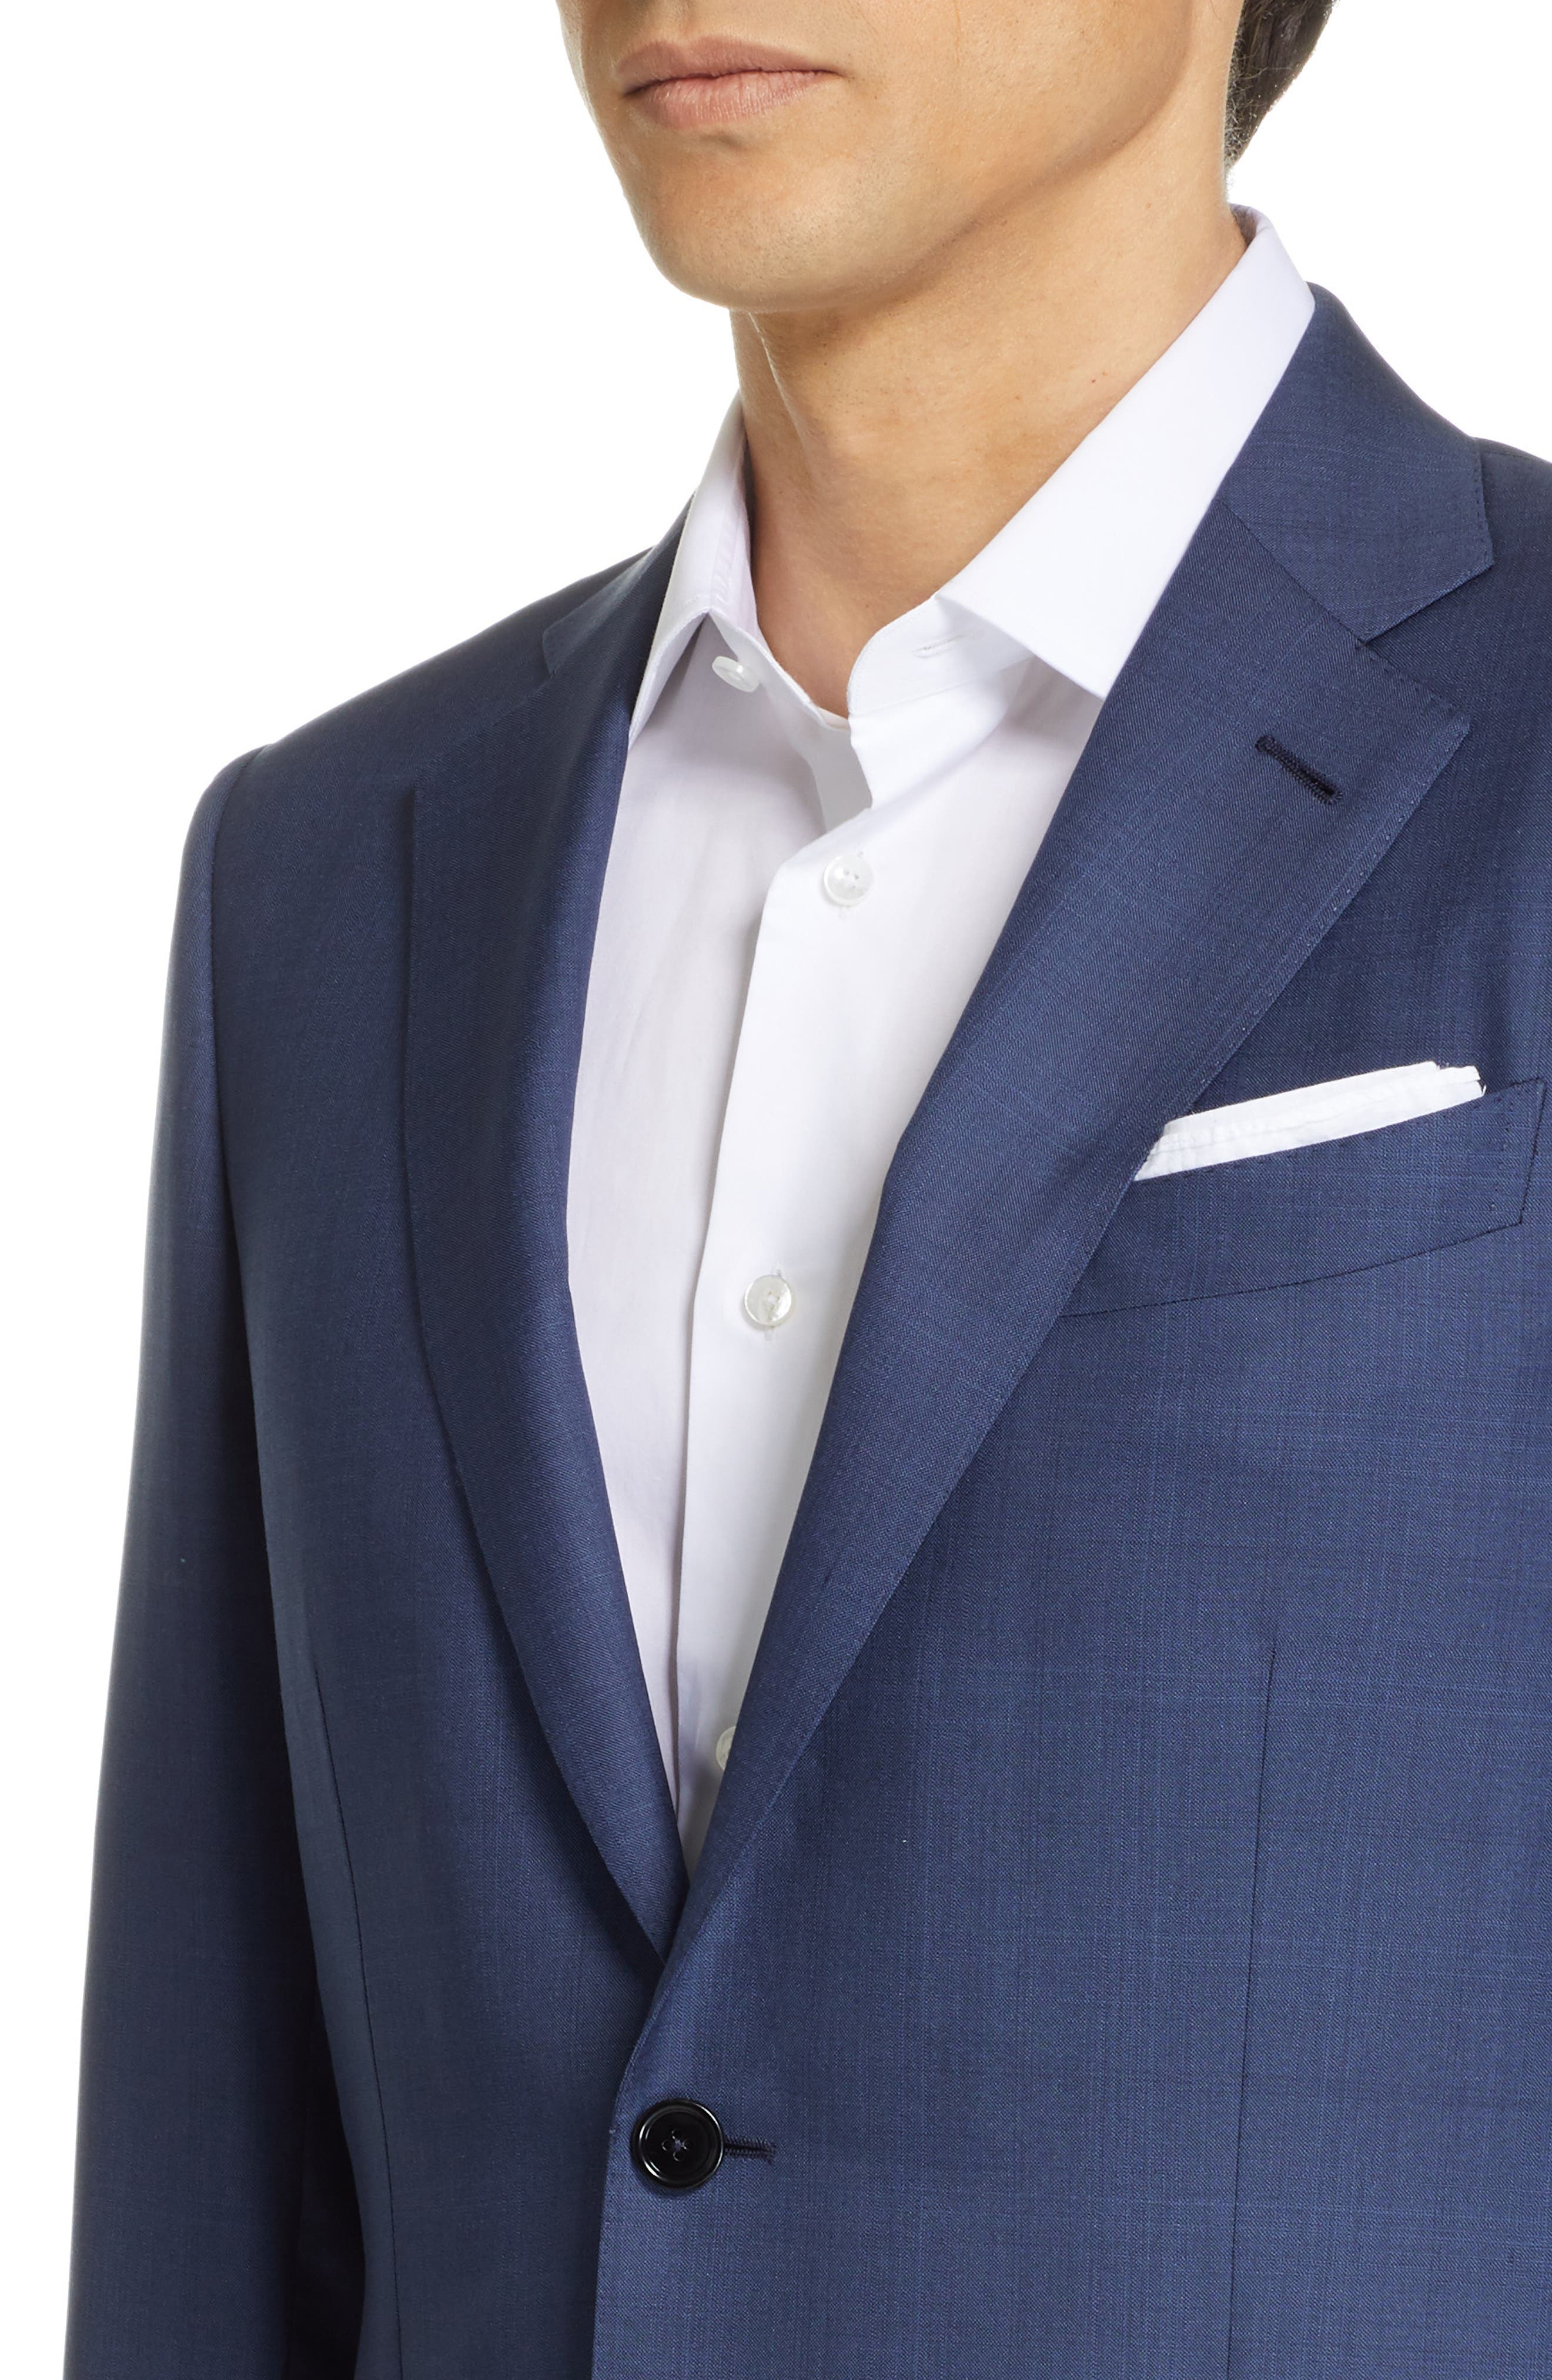 ERMENEGILDO ZEGNA, Trofeo Classic Fit Plaid Wool & Silk Suit, Alternate thumbnail 4, color, BLUE